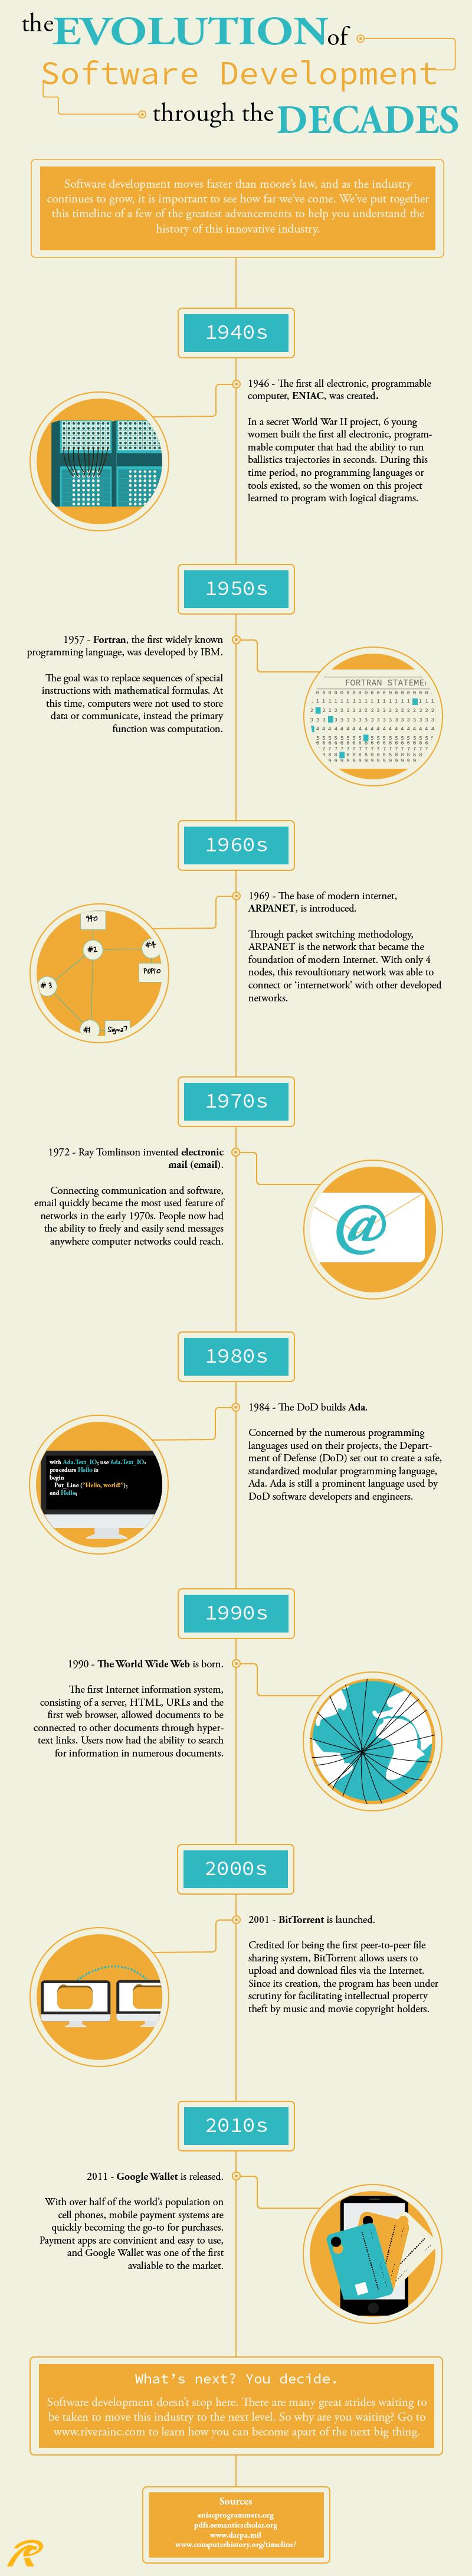 The Evolution of Software Development through the Decades